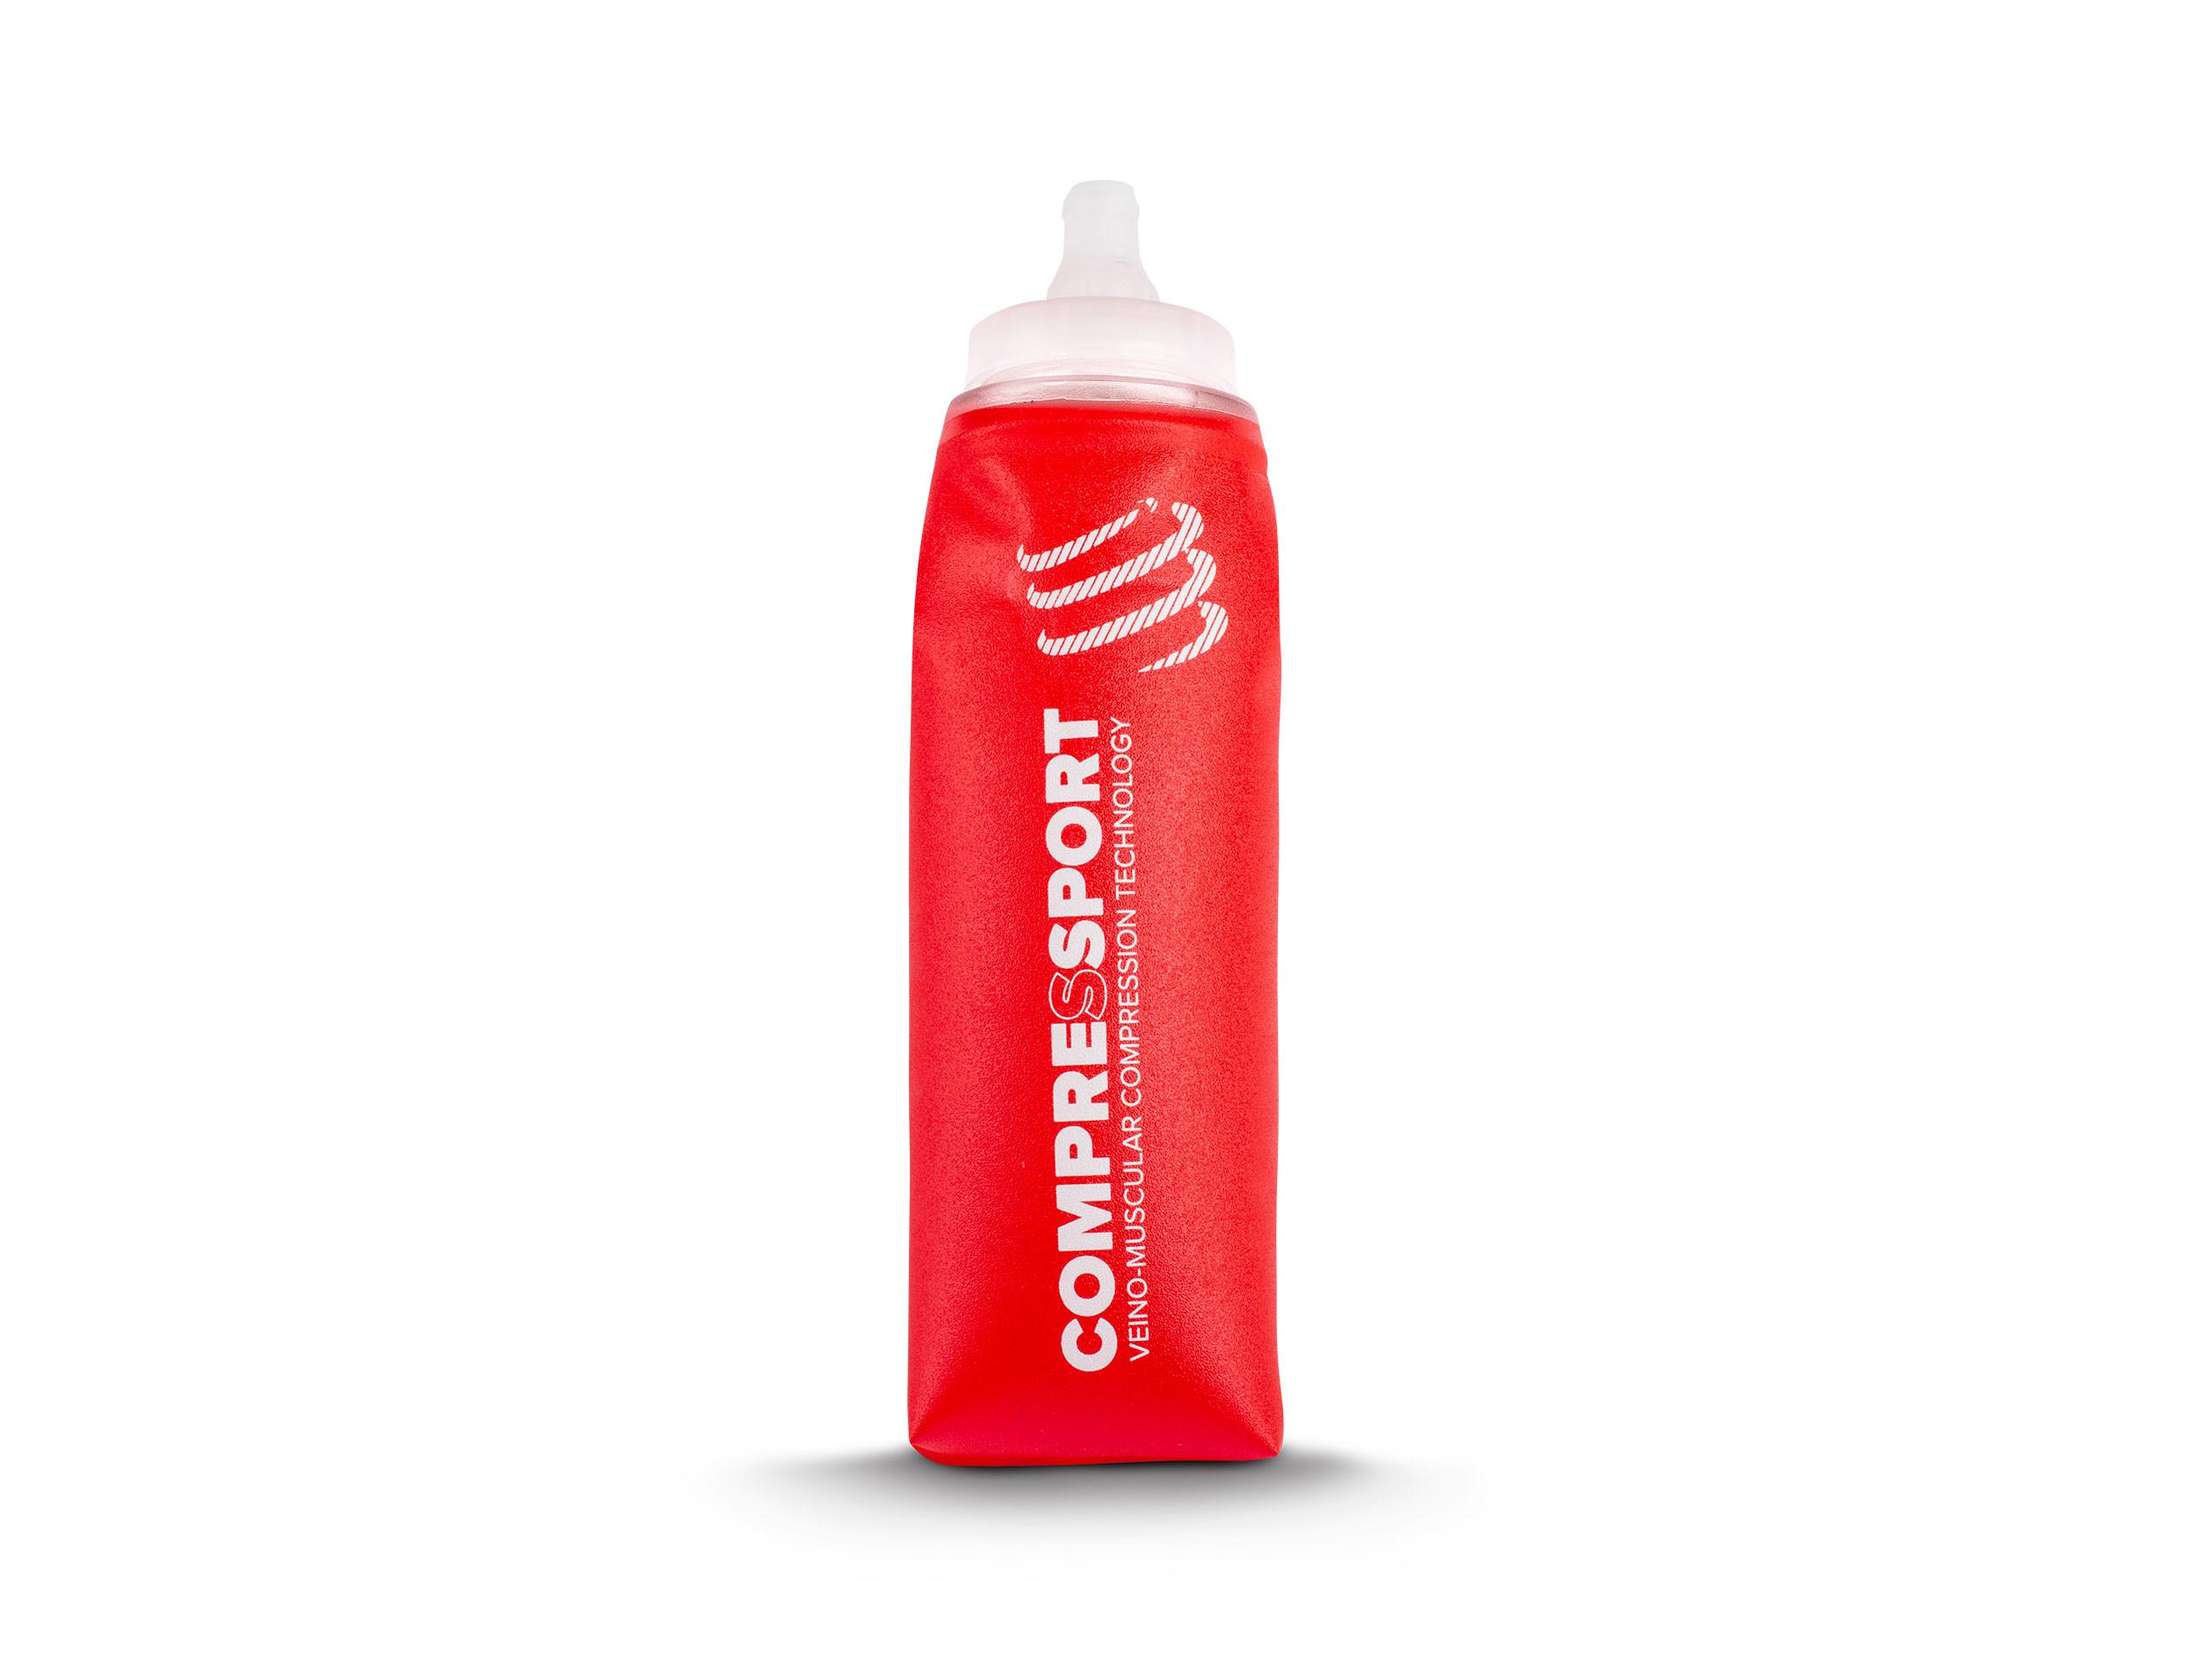 ErgoFlask rossa 600mL Valvola + tubo lungo rosso